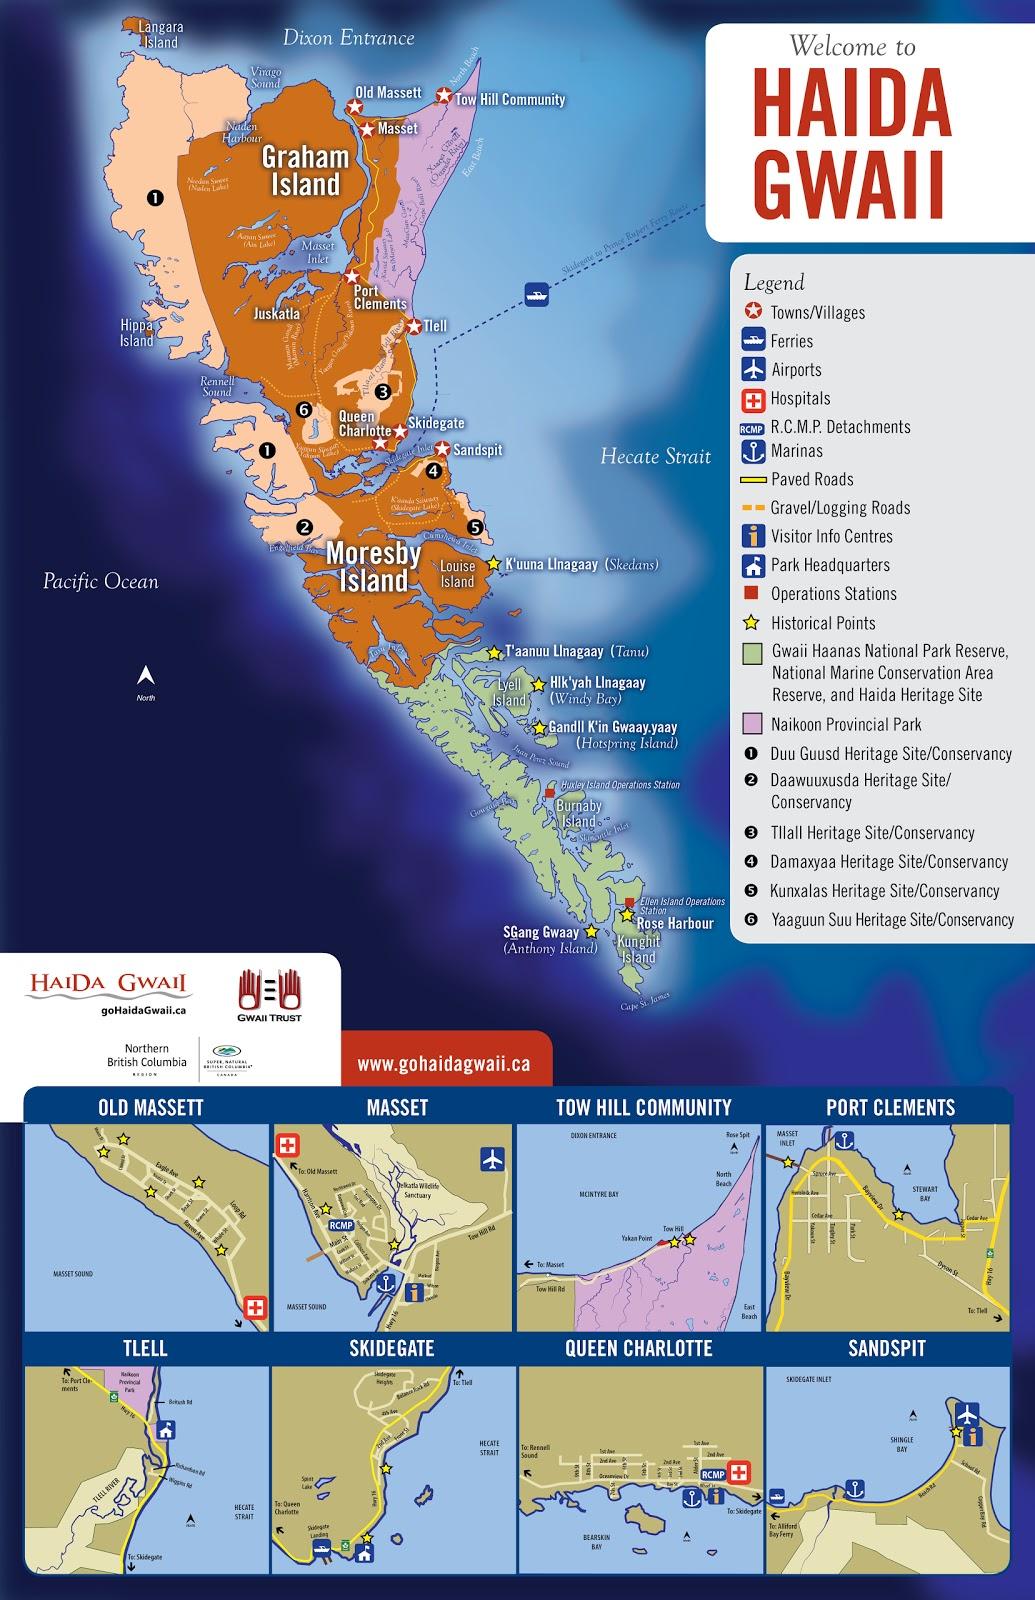 Haida Gwaii Tourism: March Mapping Madness!